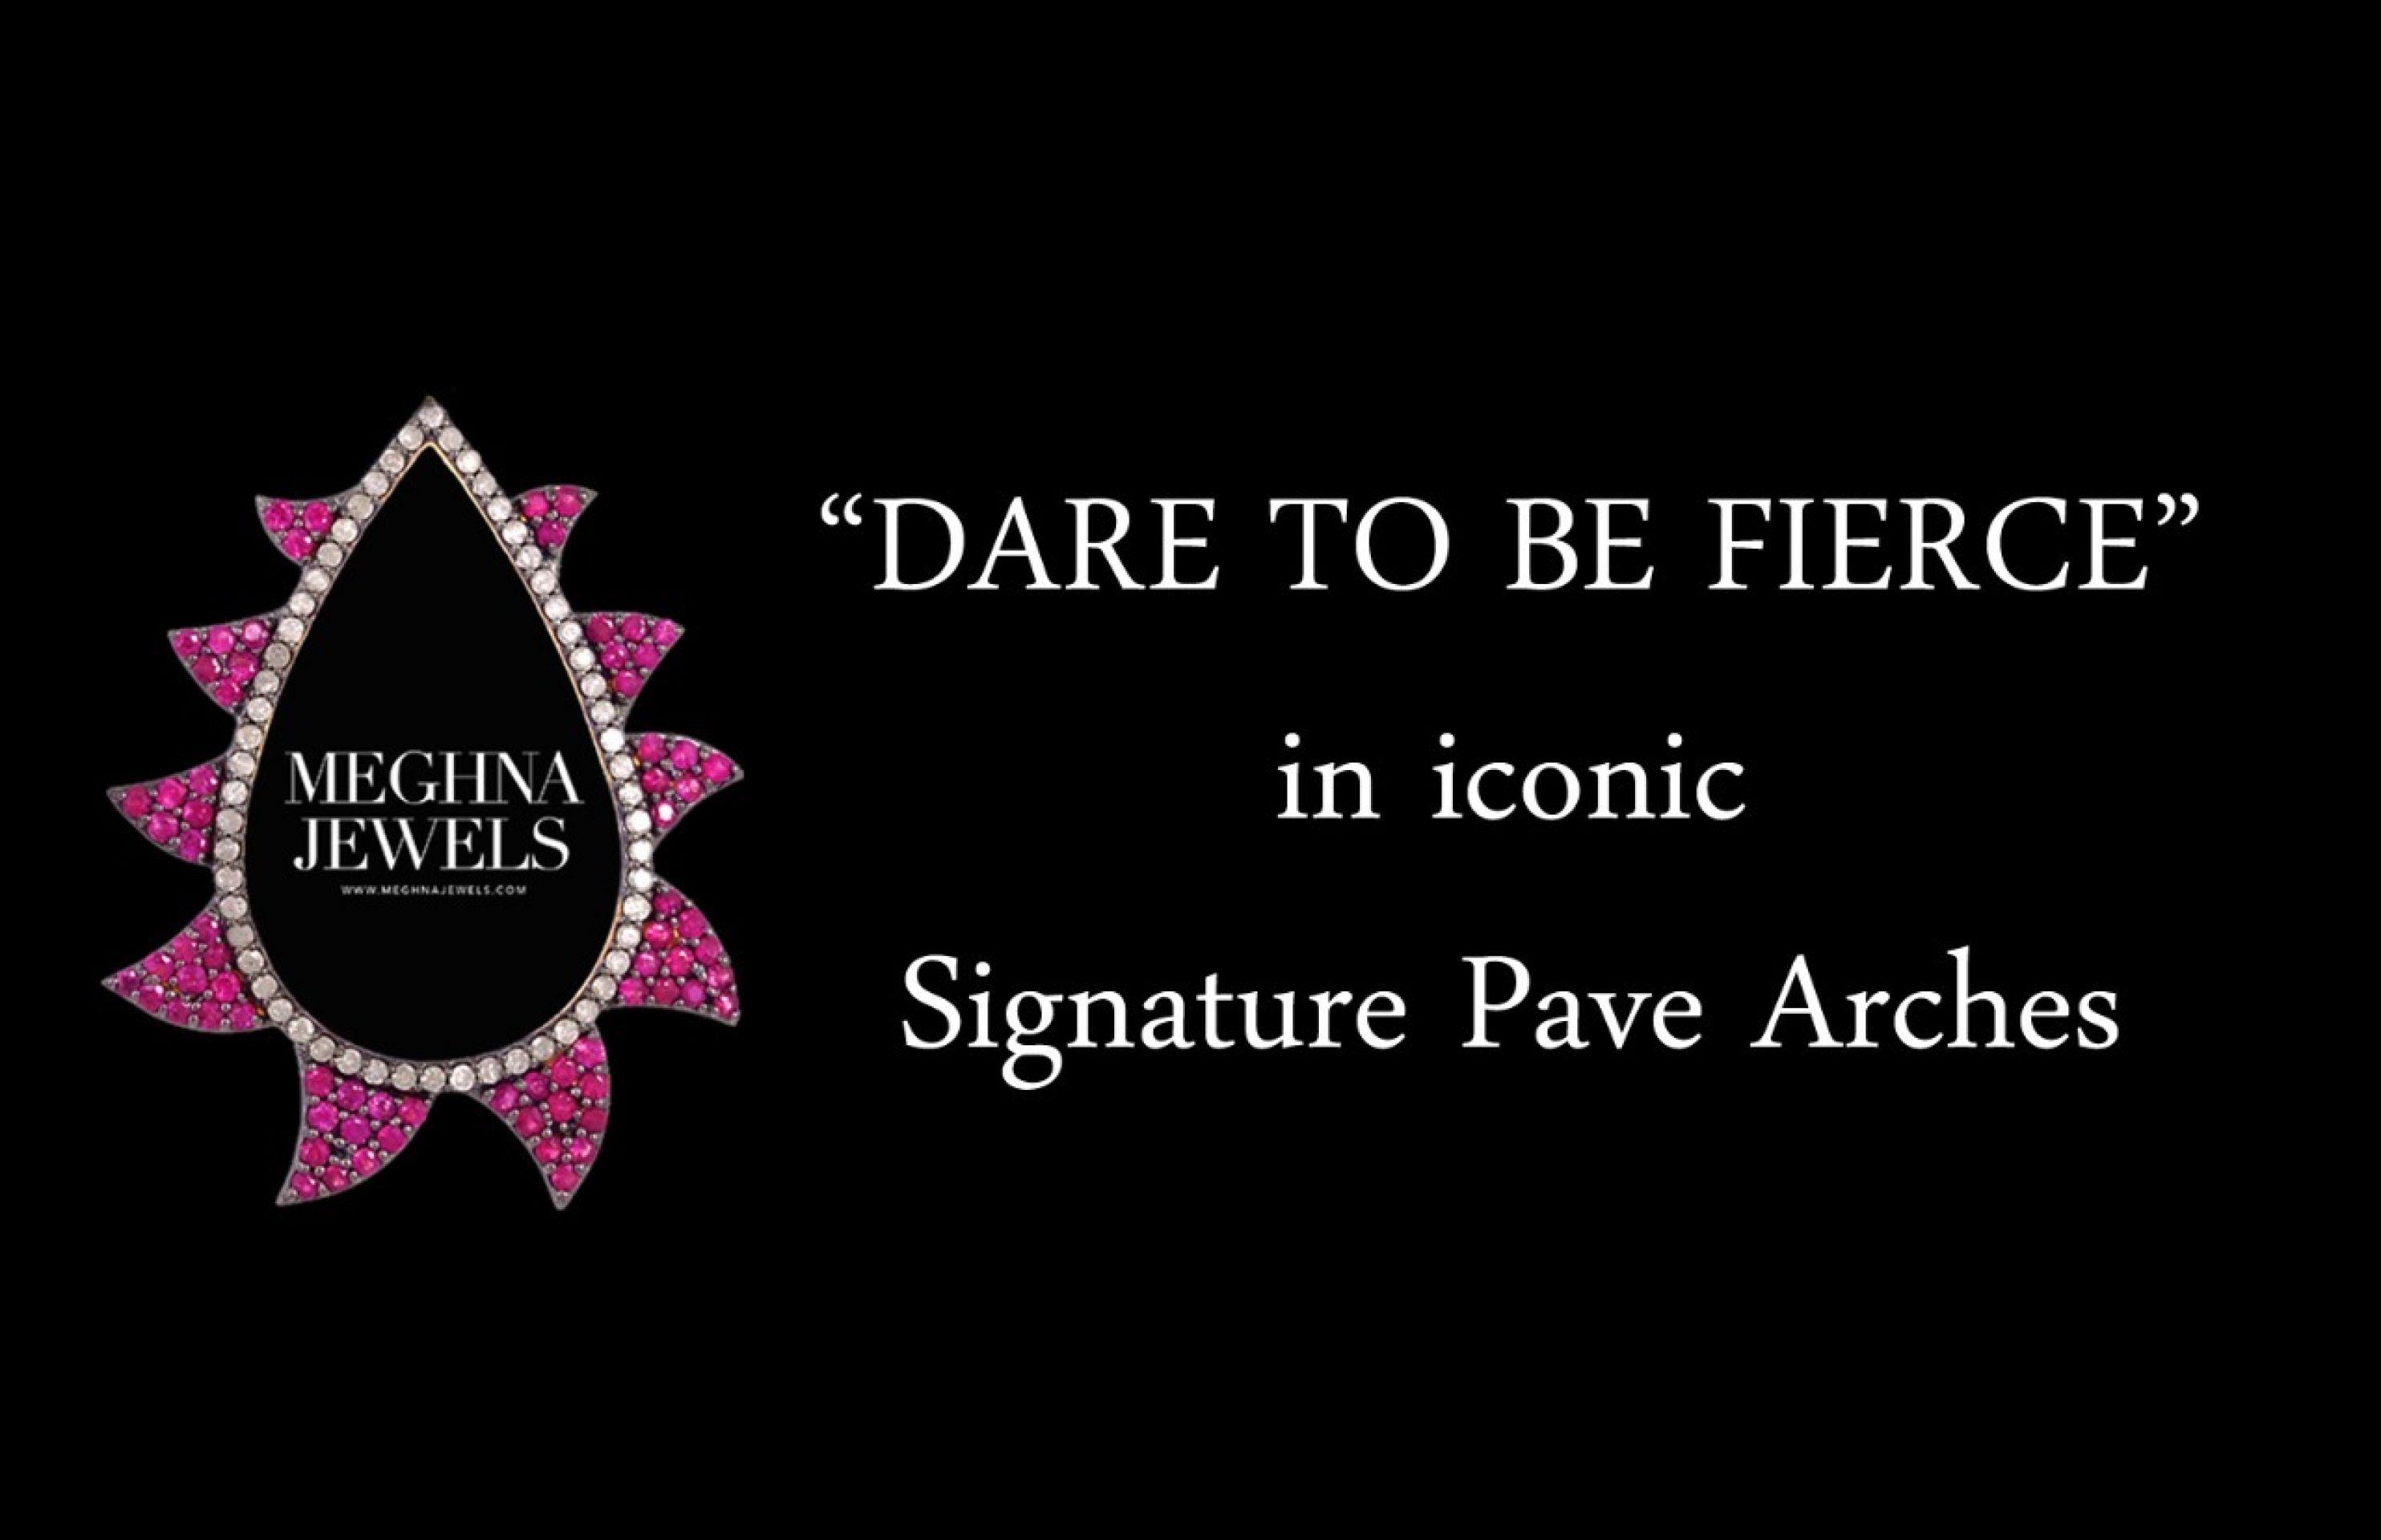 Meghna Jewels Linear Claw Drop Earrings Turquoise & Diamonds